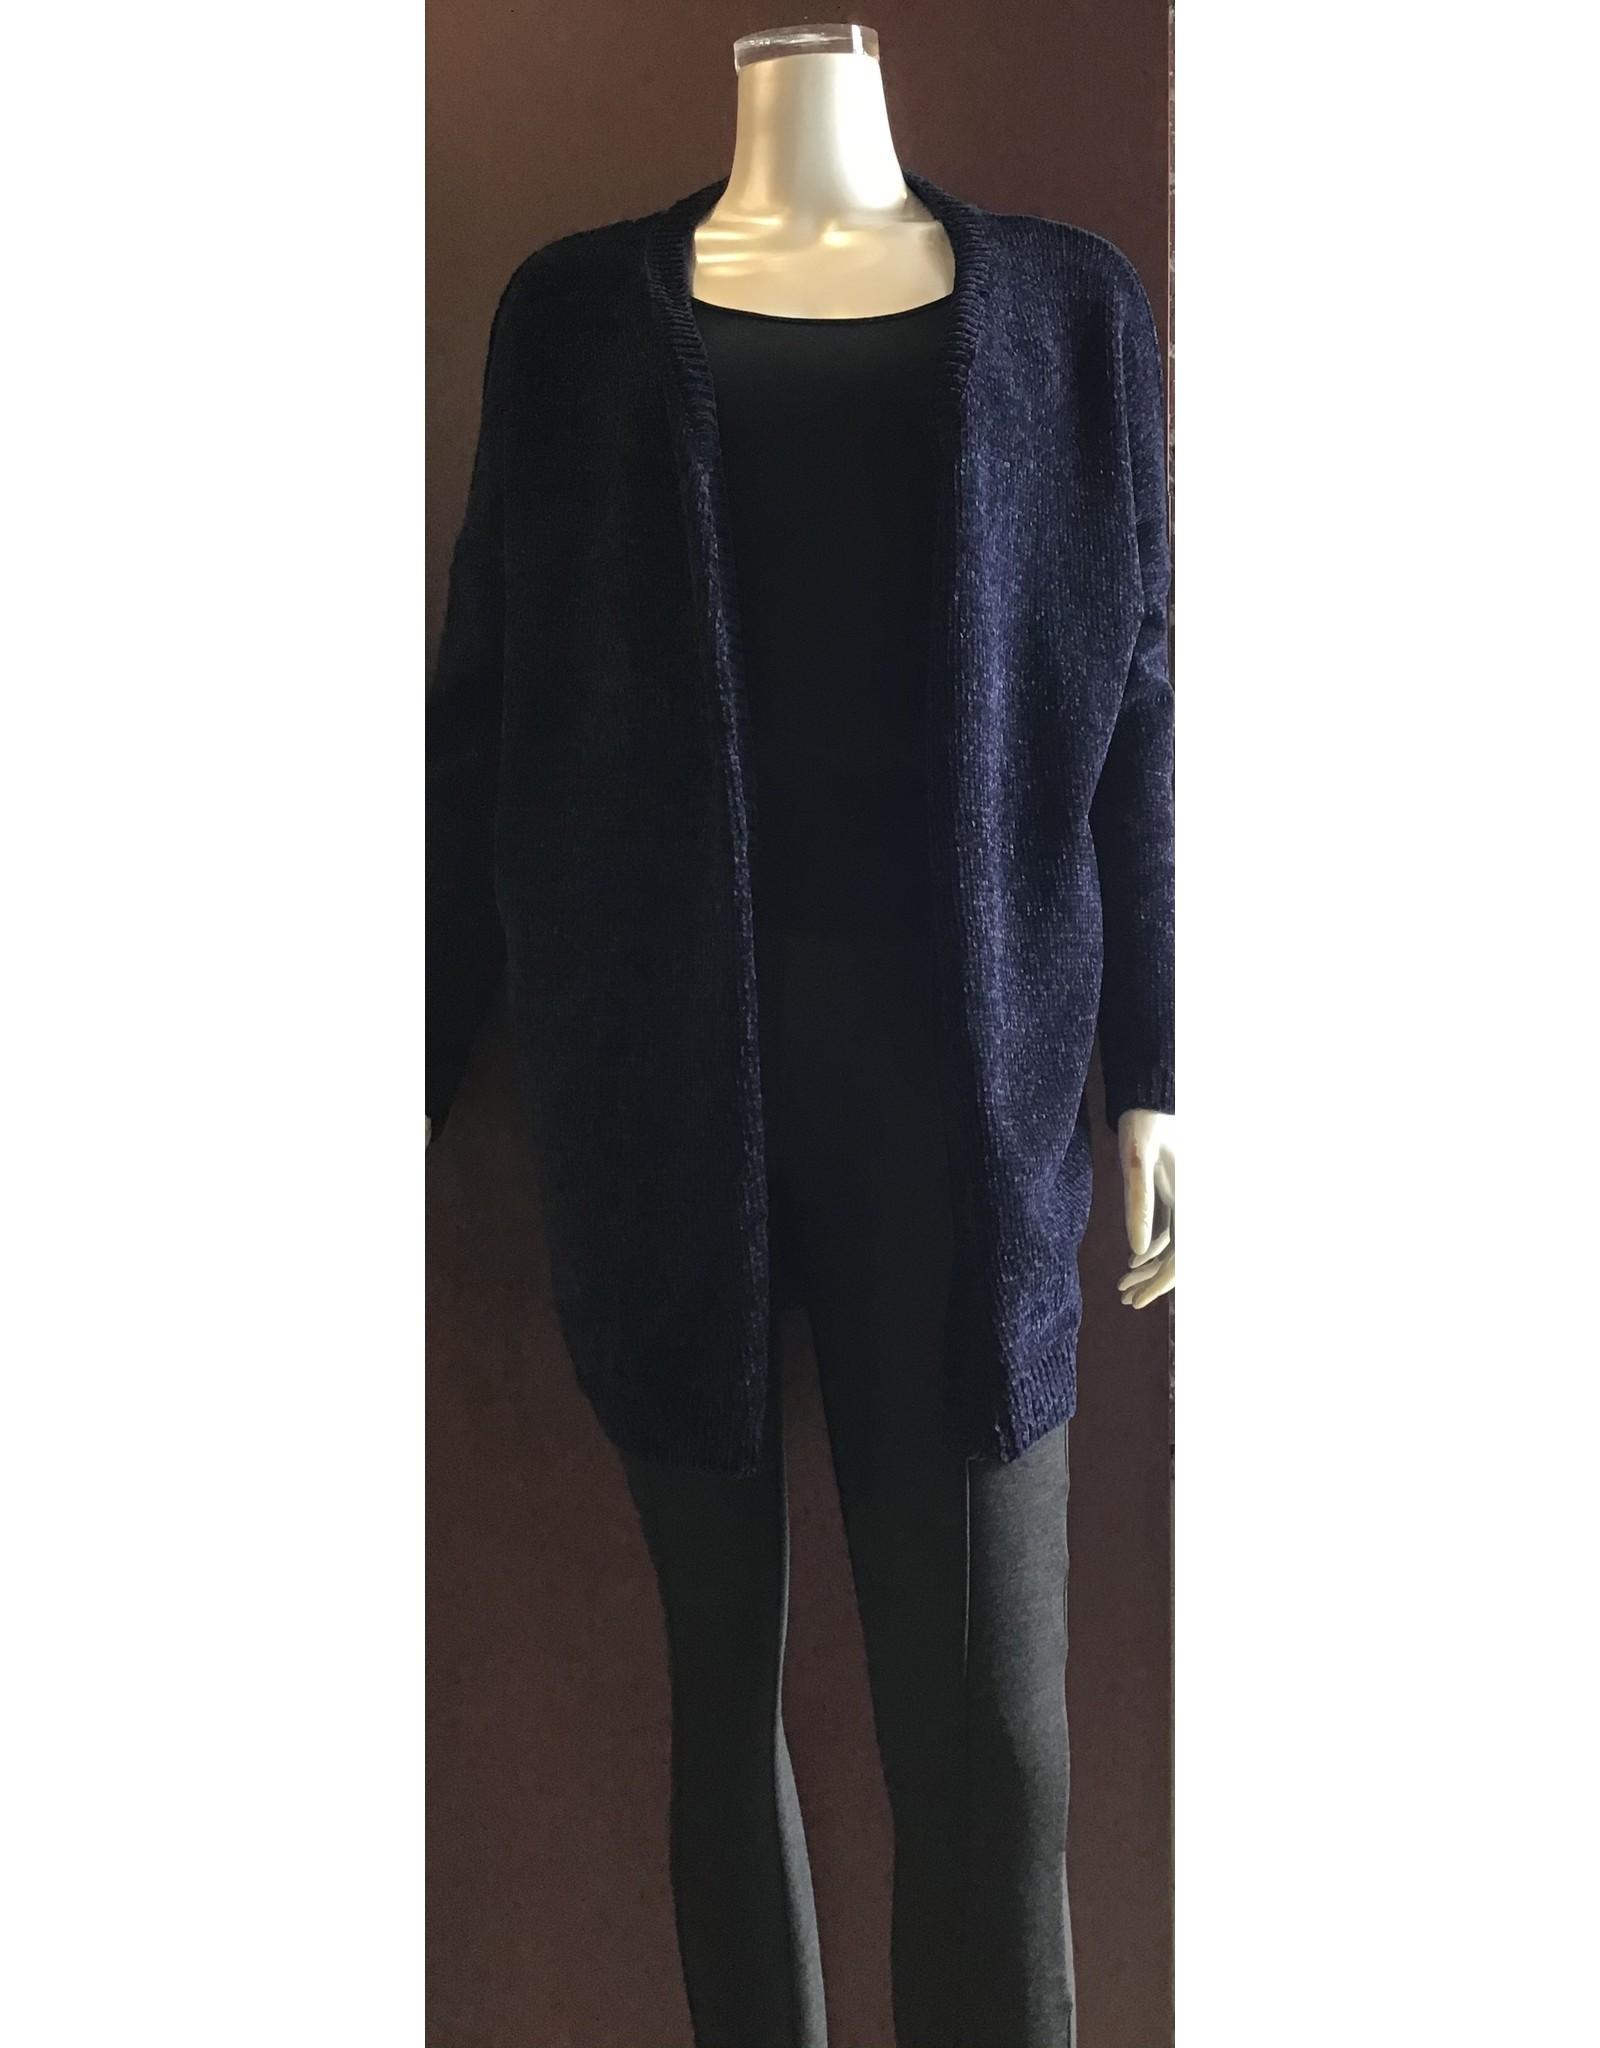 Molly Bracken Cardigan Knitted Navy